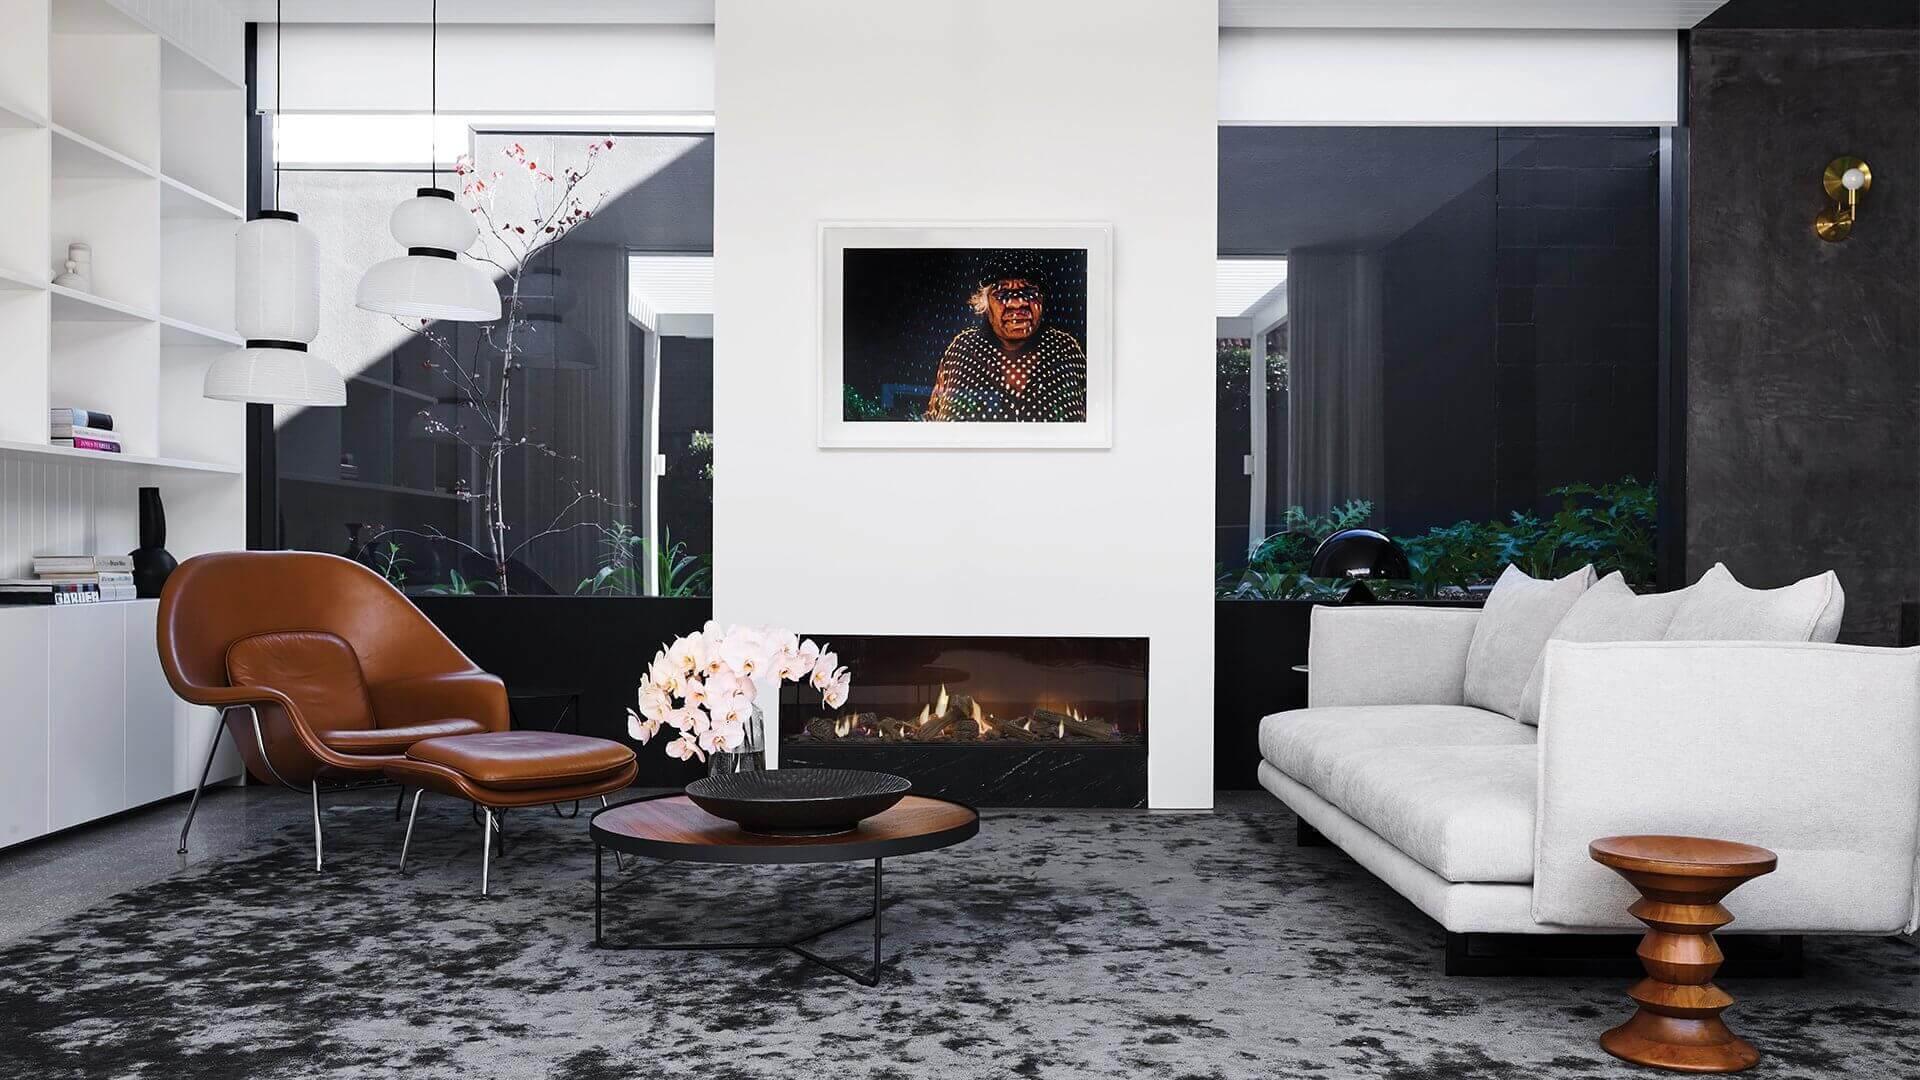 Large inbuilt wood heater in modern living room